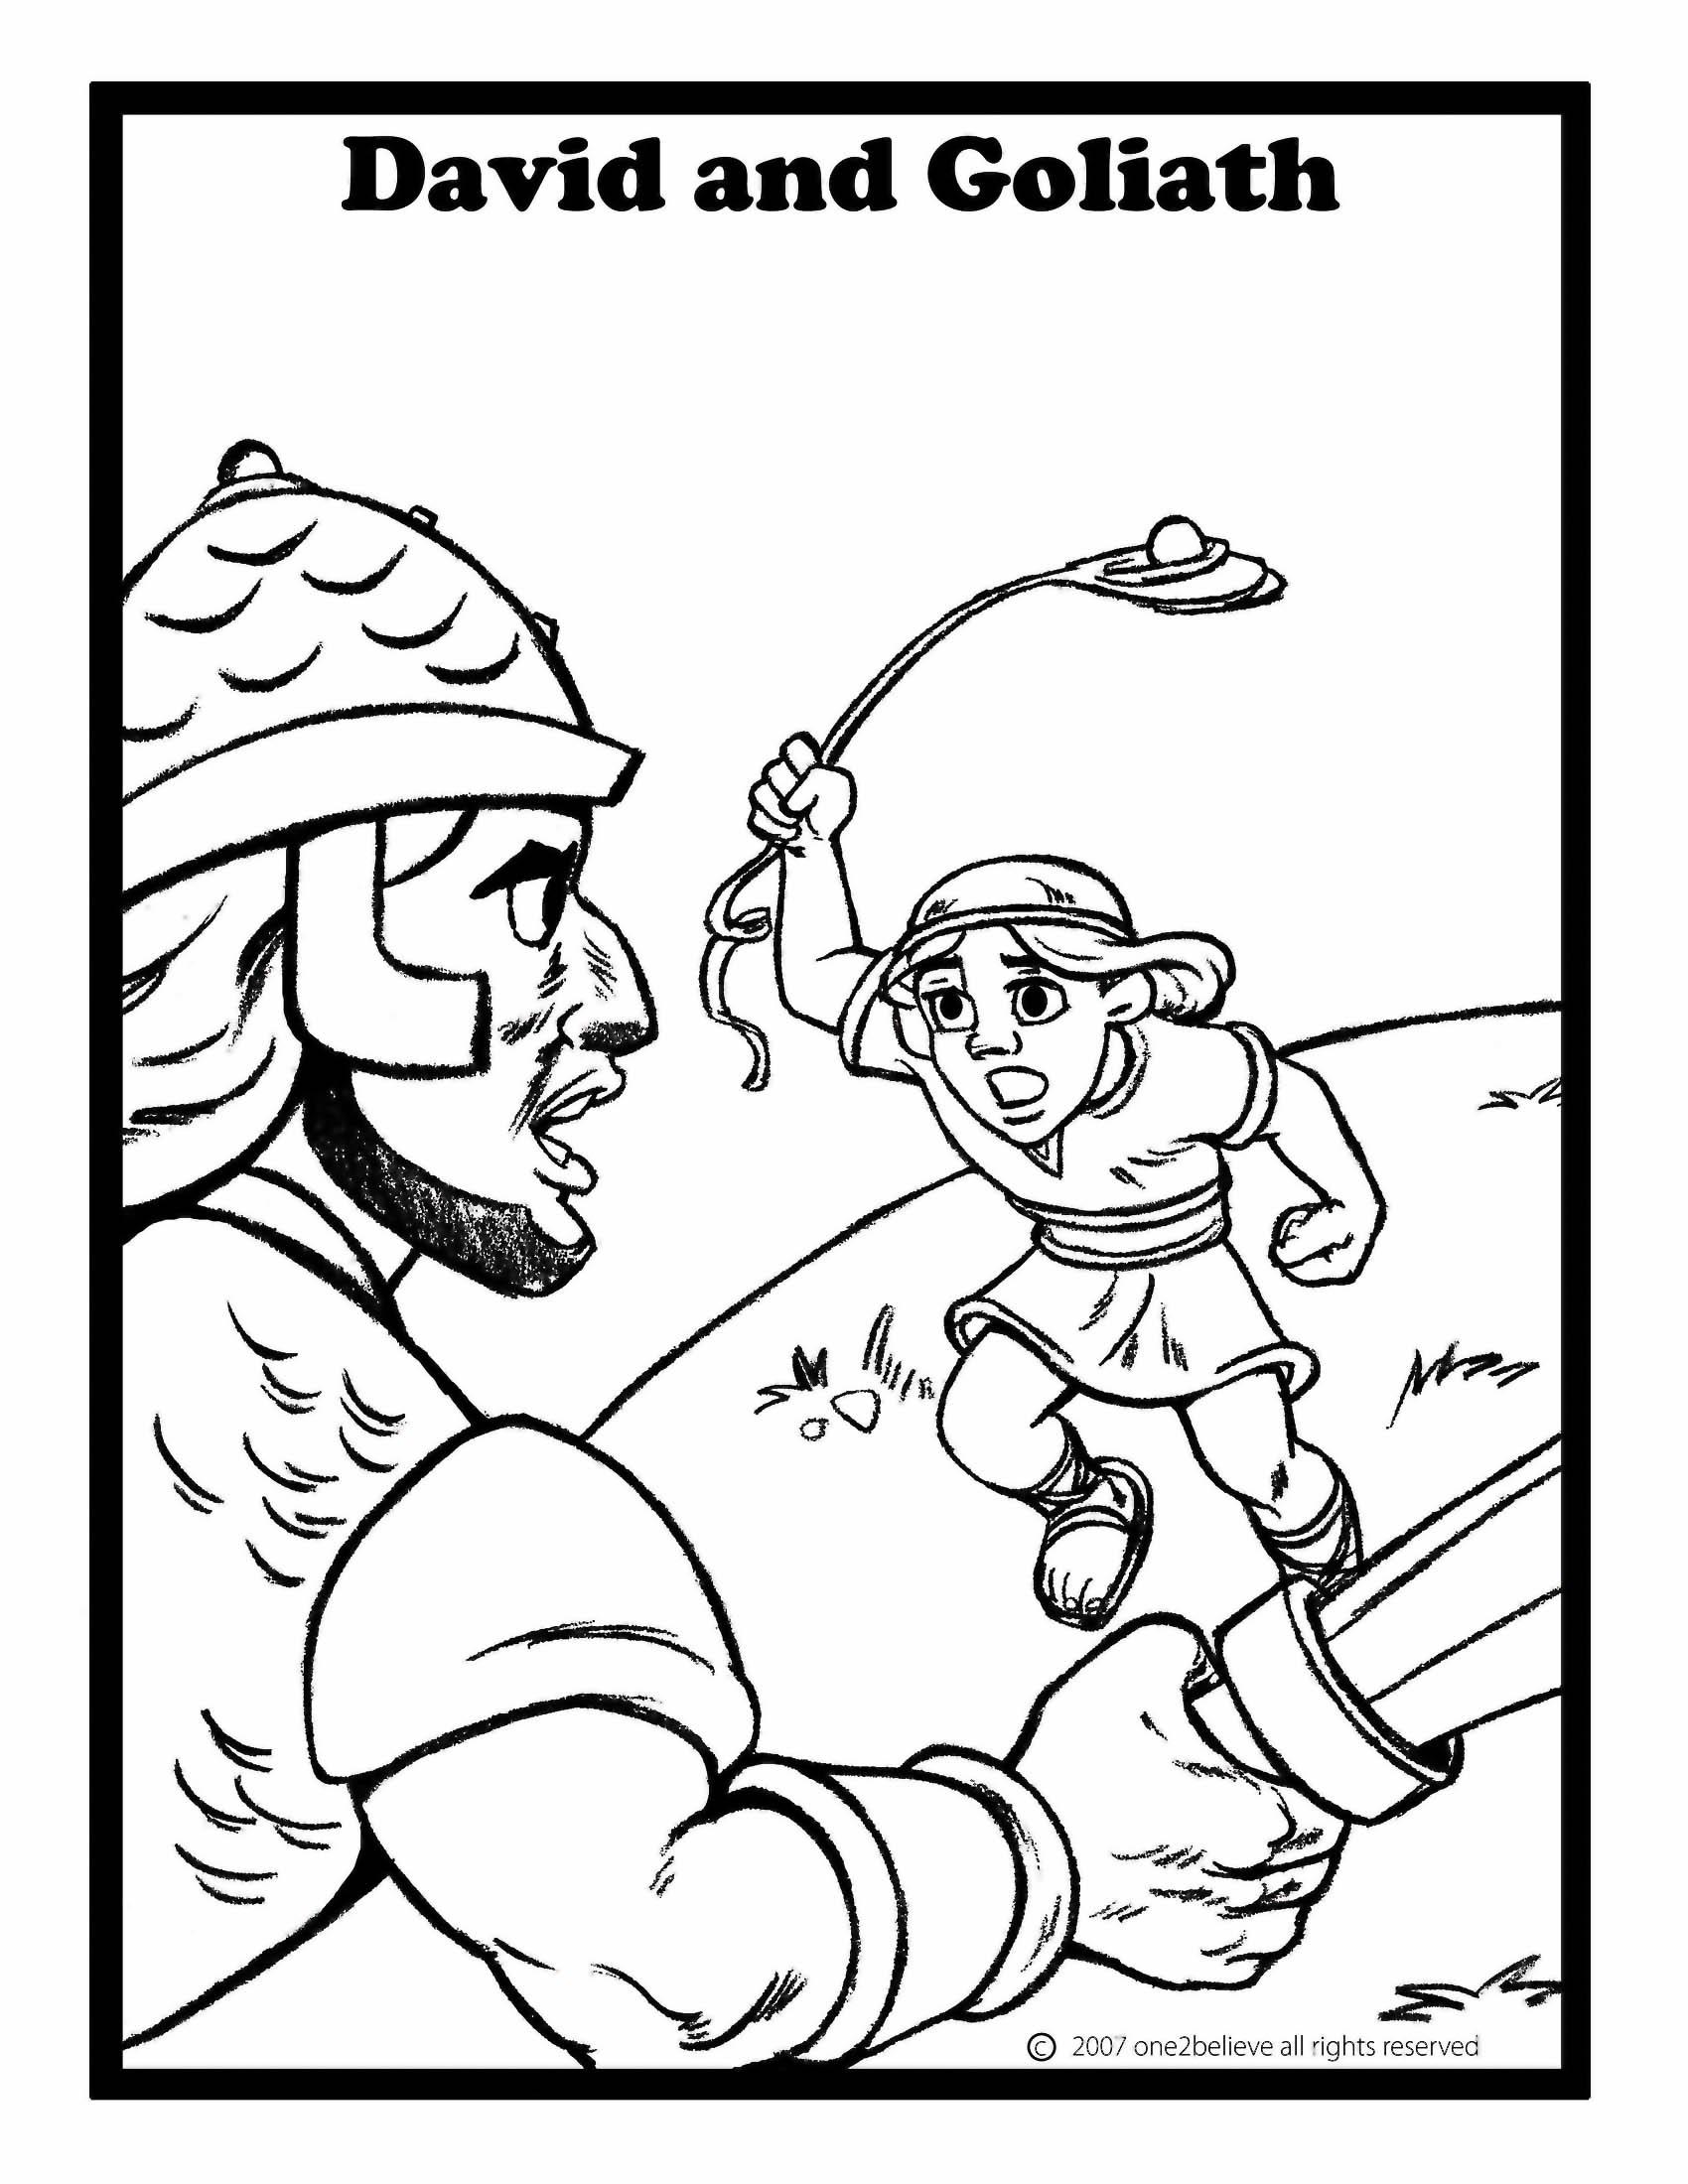 david and goliath coloring page bible david as king coloring pages sketch coloring page and goliath page david coloring